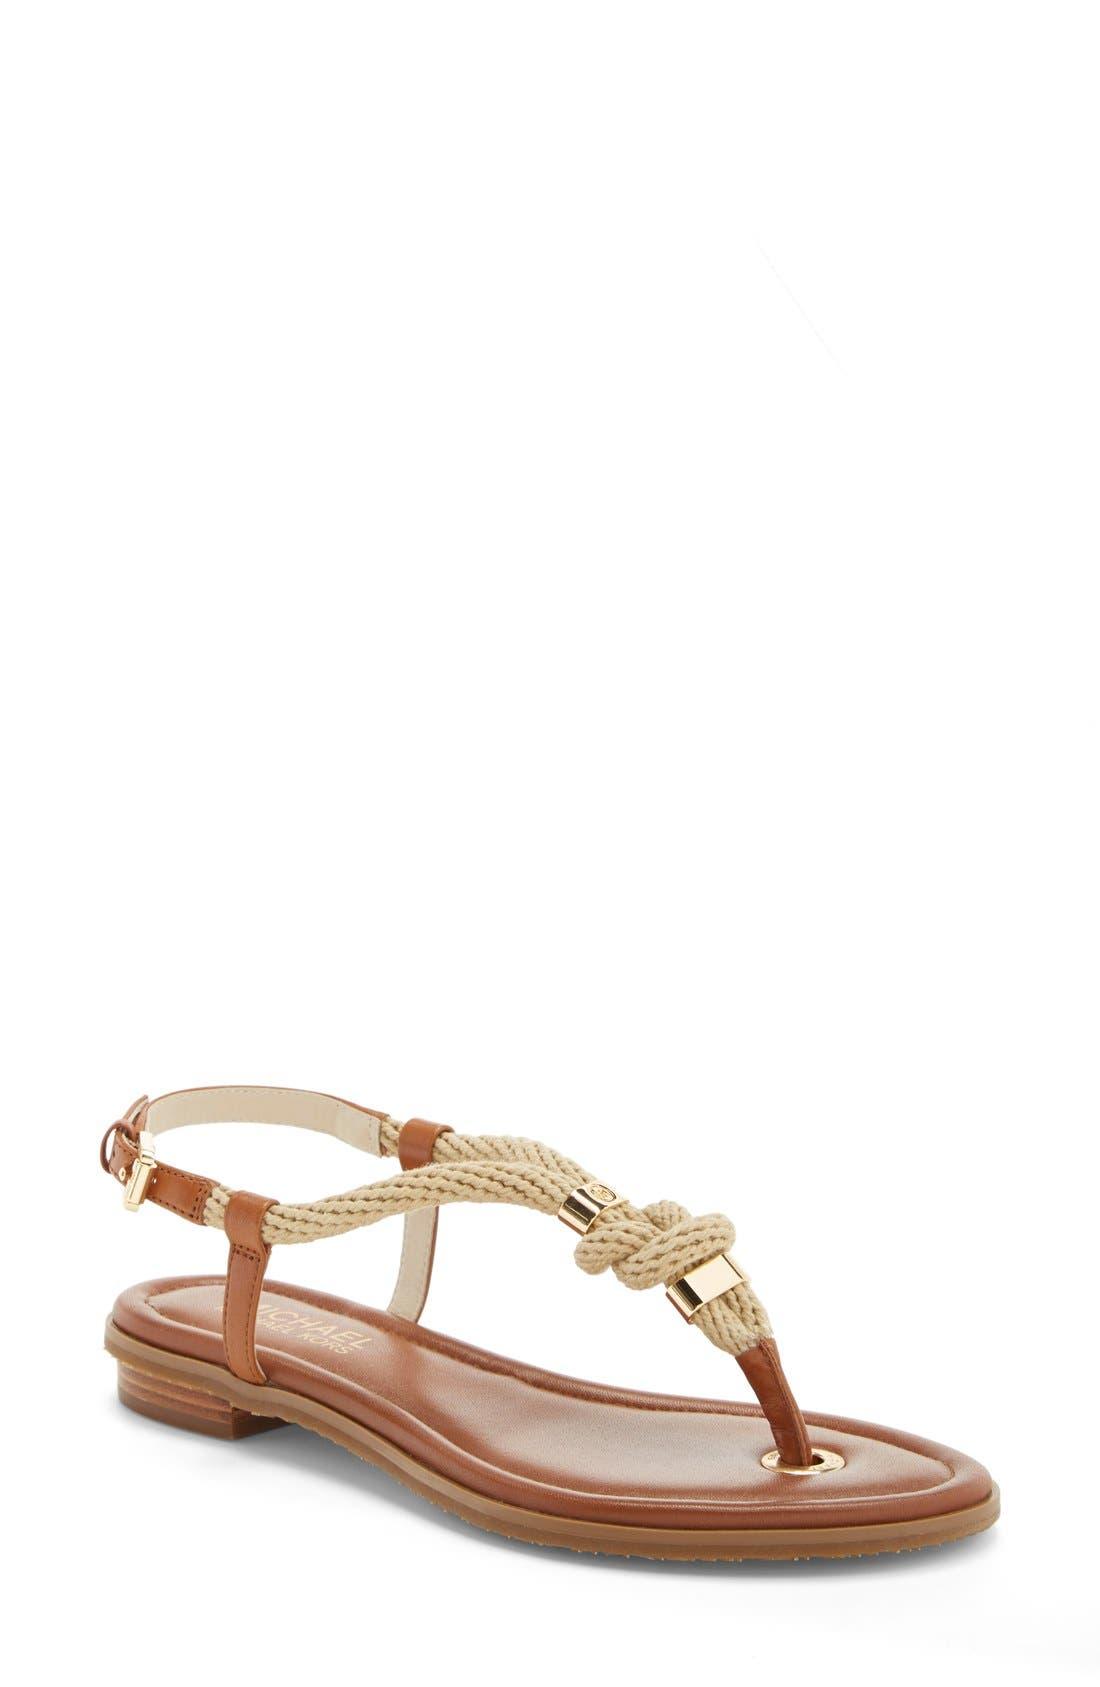 Alternate Image 1 Selected - MICHAEL Michael Kors 'Holly' Leather Thong Sandal (Women)